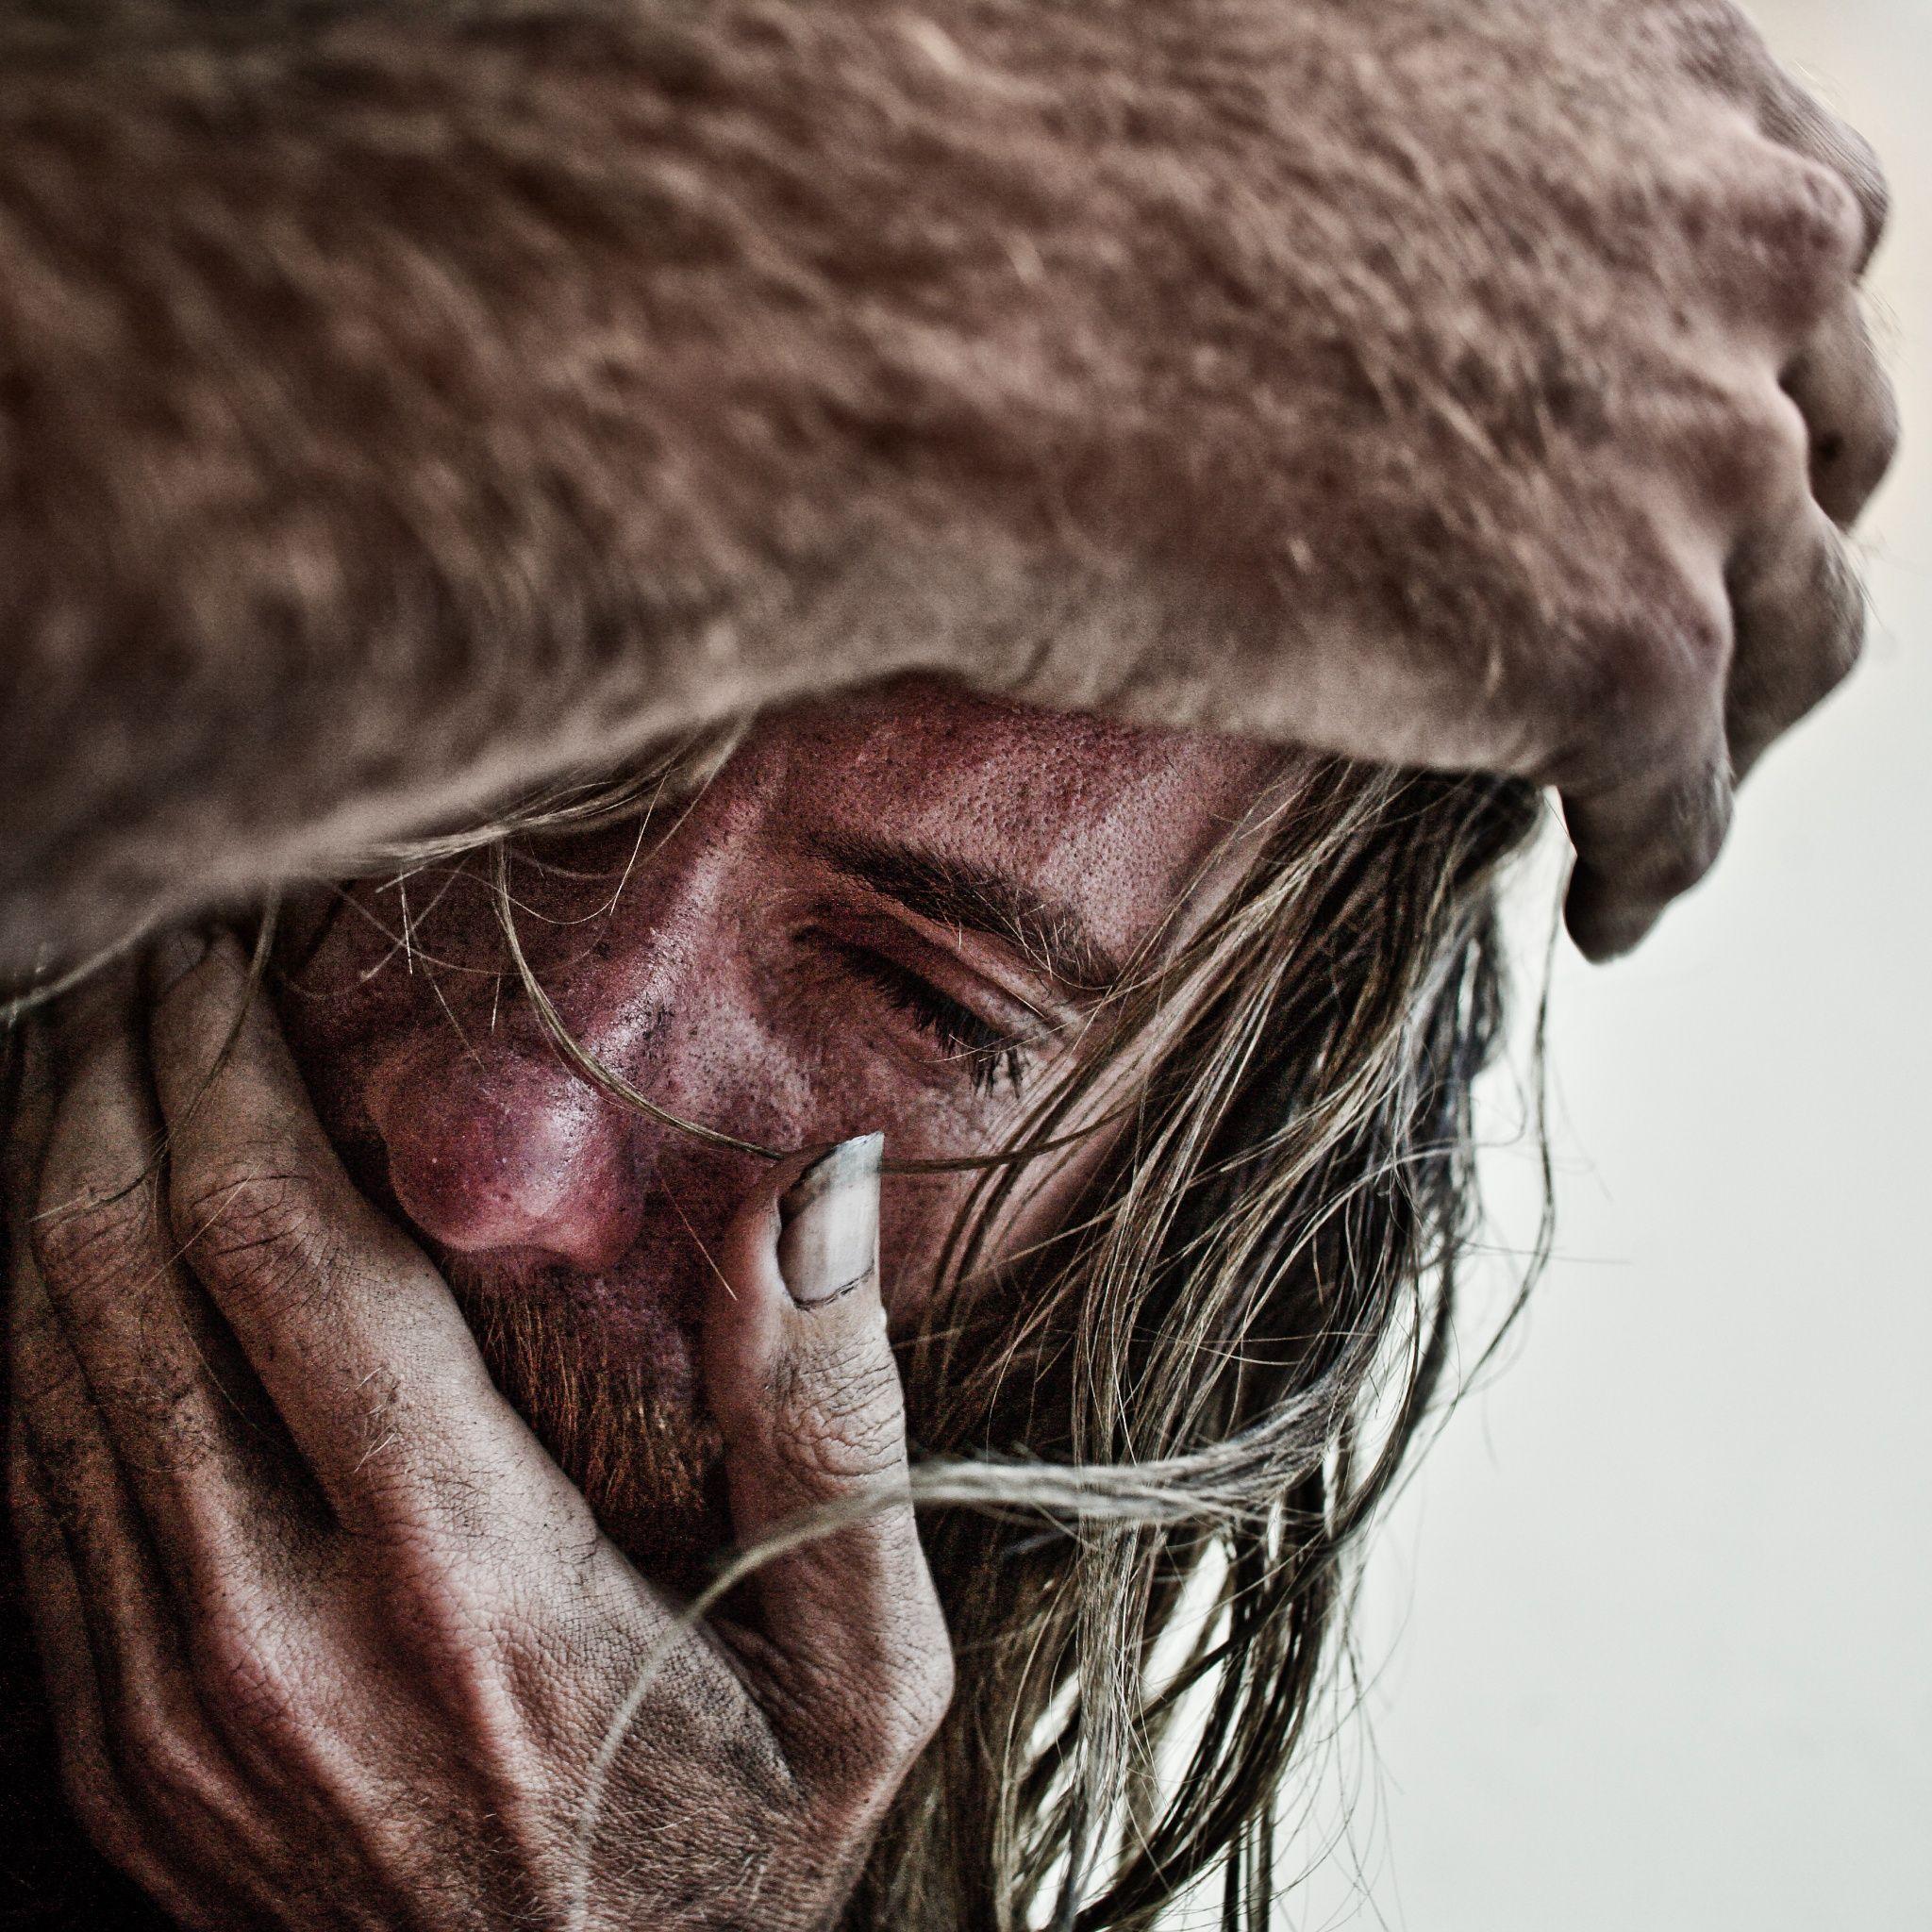 """Andy"", homeless in Miami, Florida, US by Lee Jeffries on 500px HomeLessNess, Sans Abris, Obdachlos, Senza Dimora, Senza Tetto, Poverty, Pobreza, Pauvreté, Povertà, Hopeless, JobLess, бідність, Social Issues, Awareness"